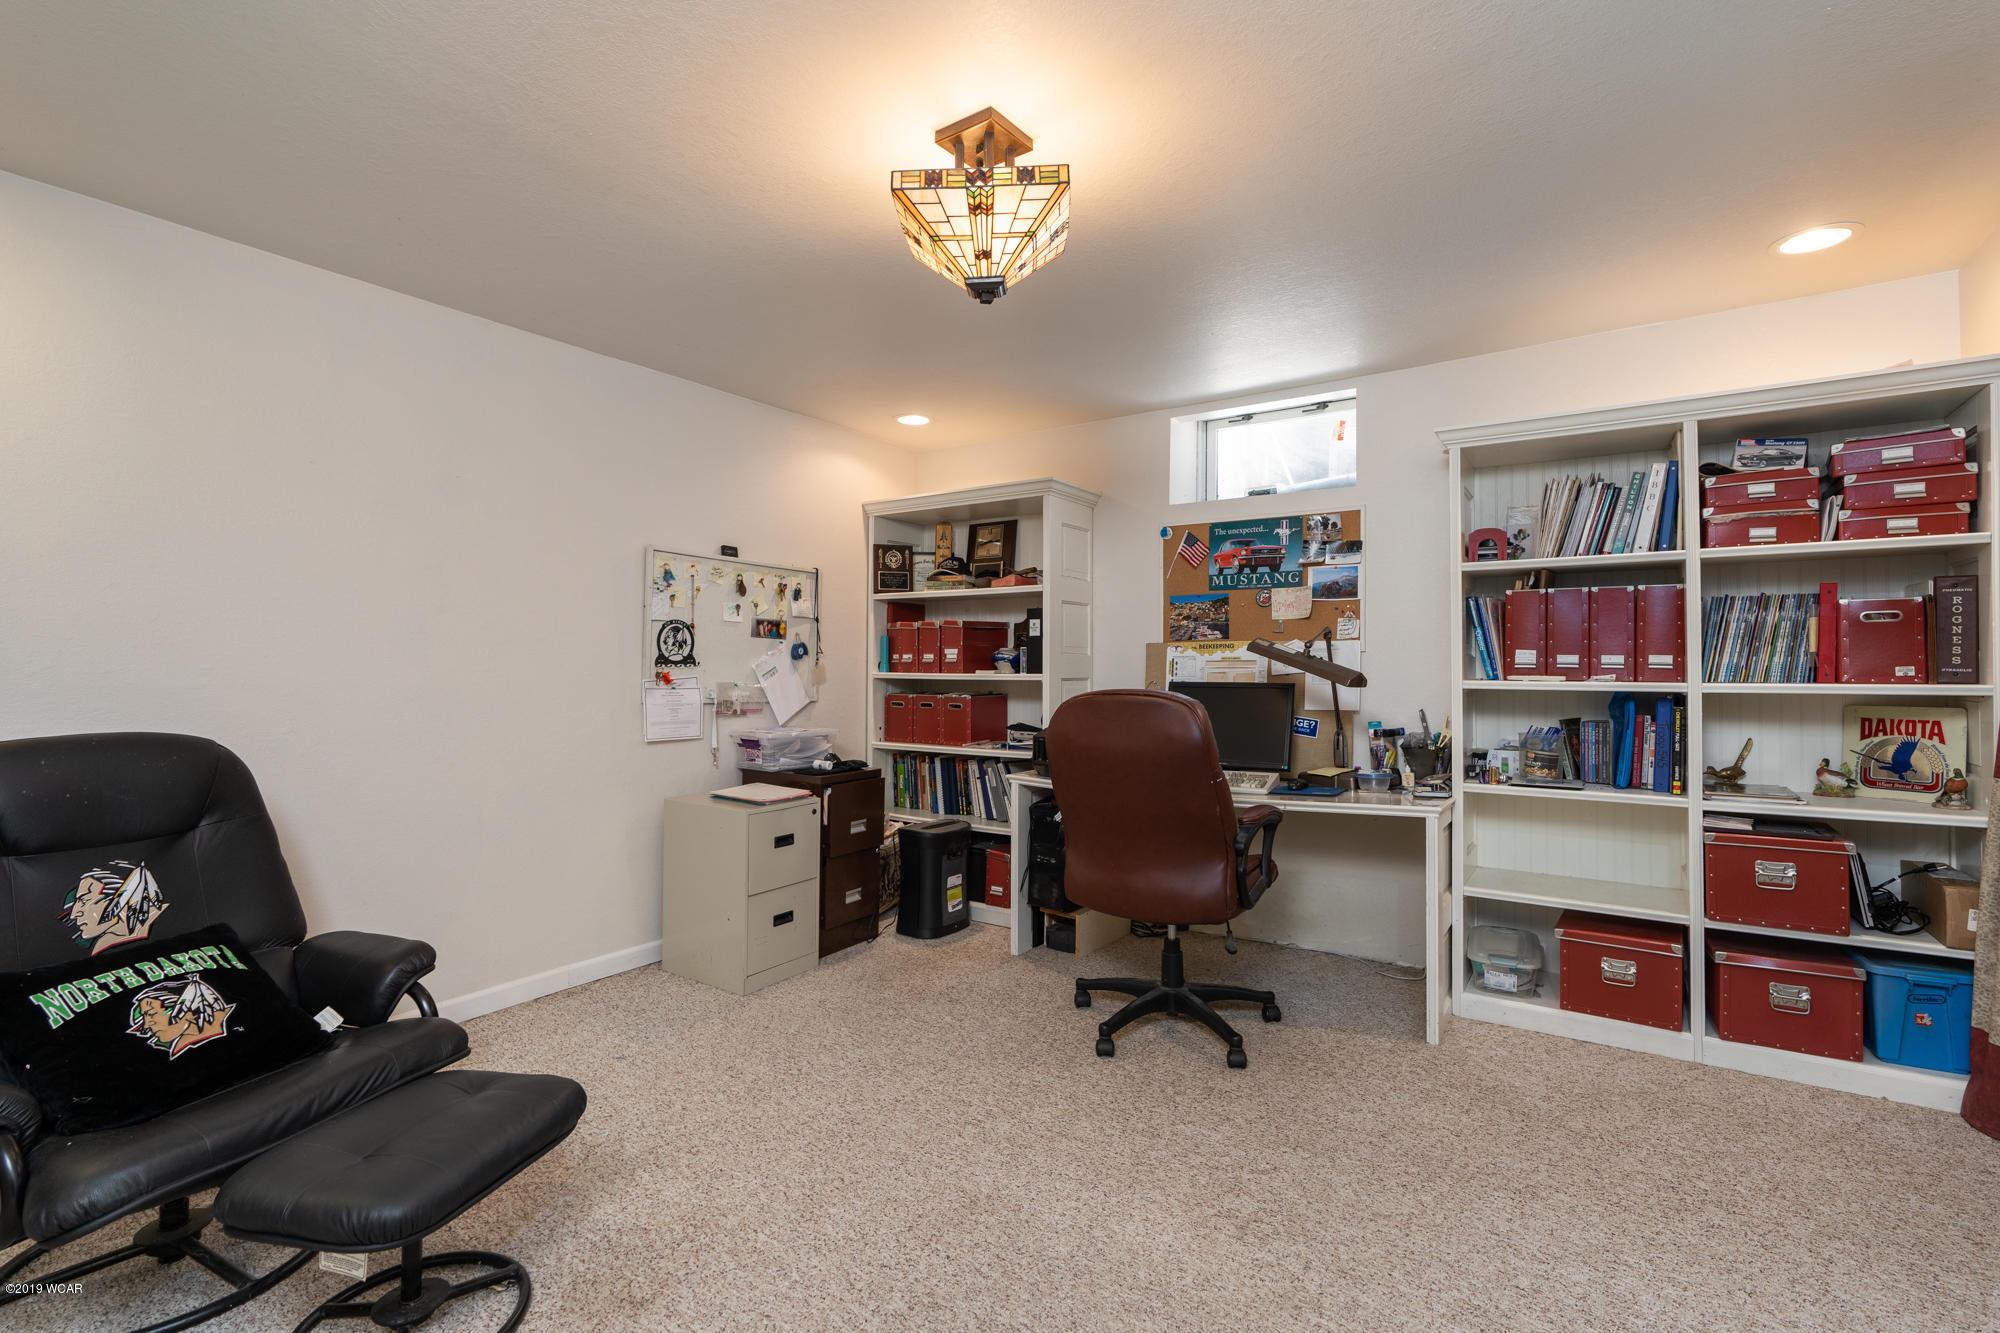 9152 Lake Avenue,Spicer,4 Bedrooms Bedrooms,5 BathroomsBathrooms,Single Family,Lake Avenue,6033567